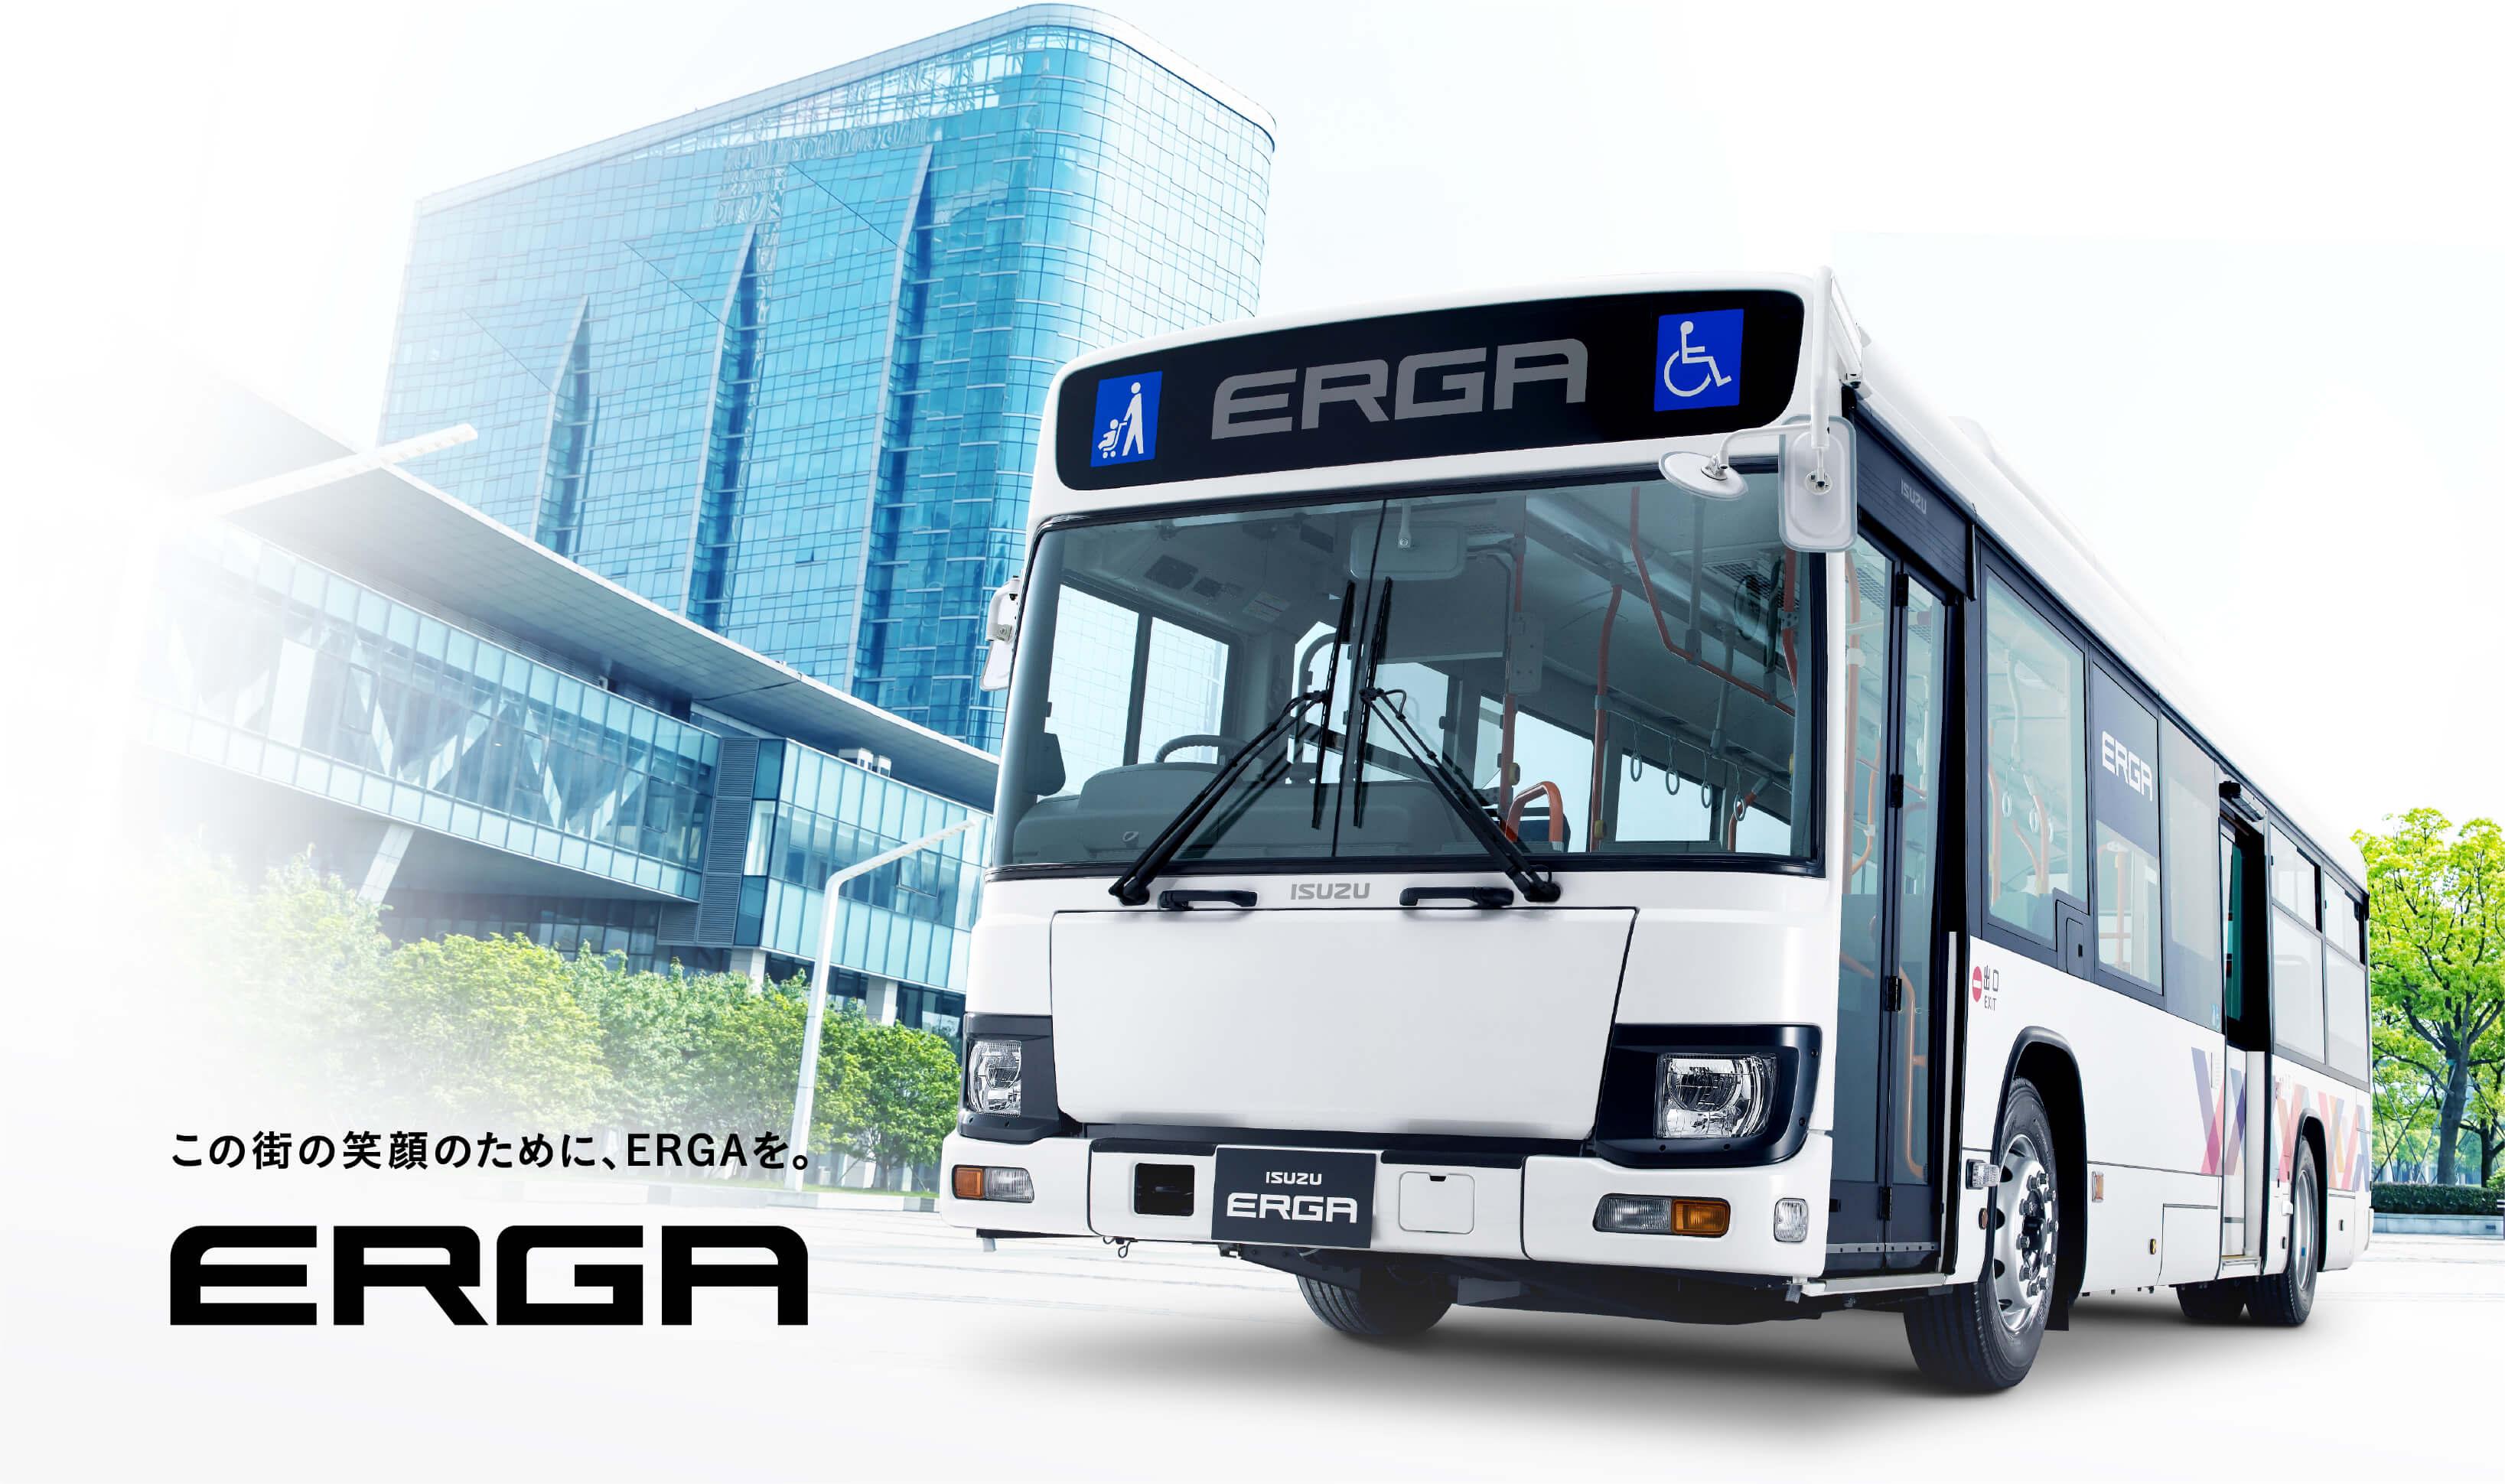 https://www.isuzu.co.jp/product/bus/erga_rt/images/img_top_main.jpg